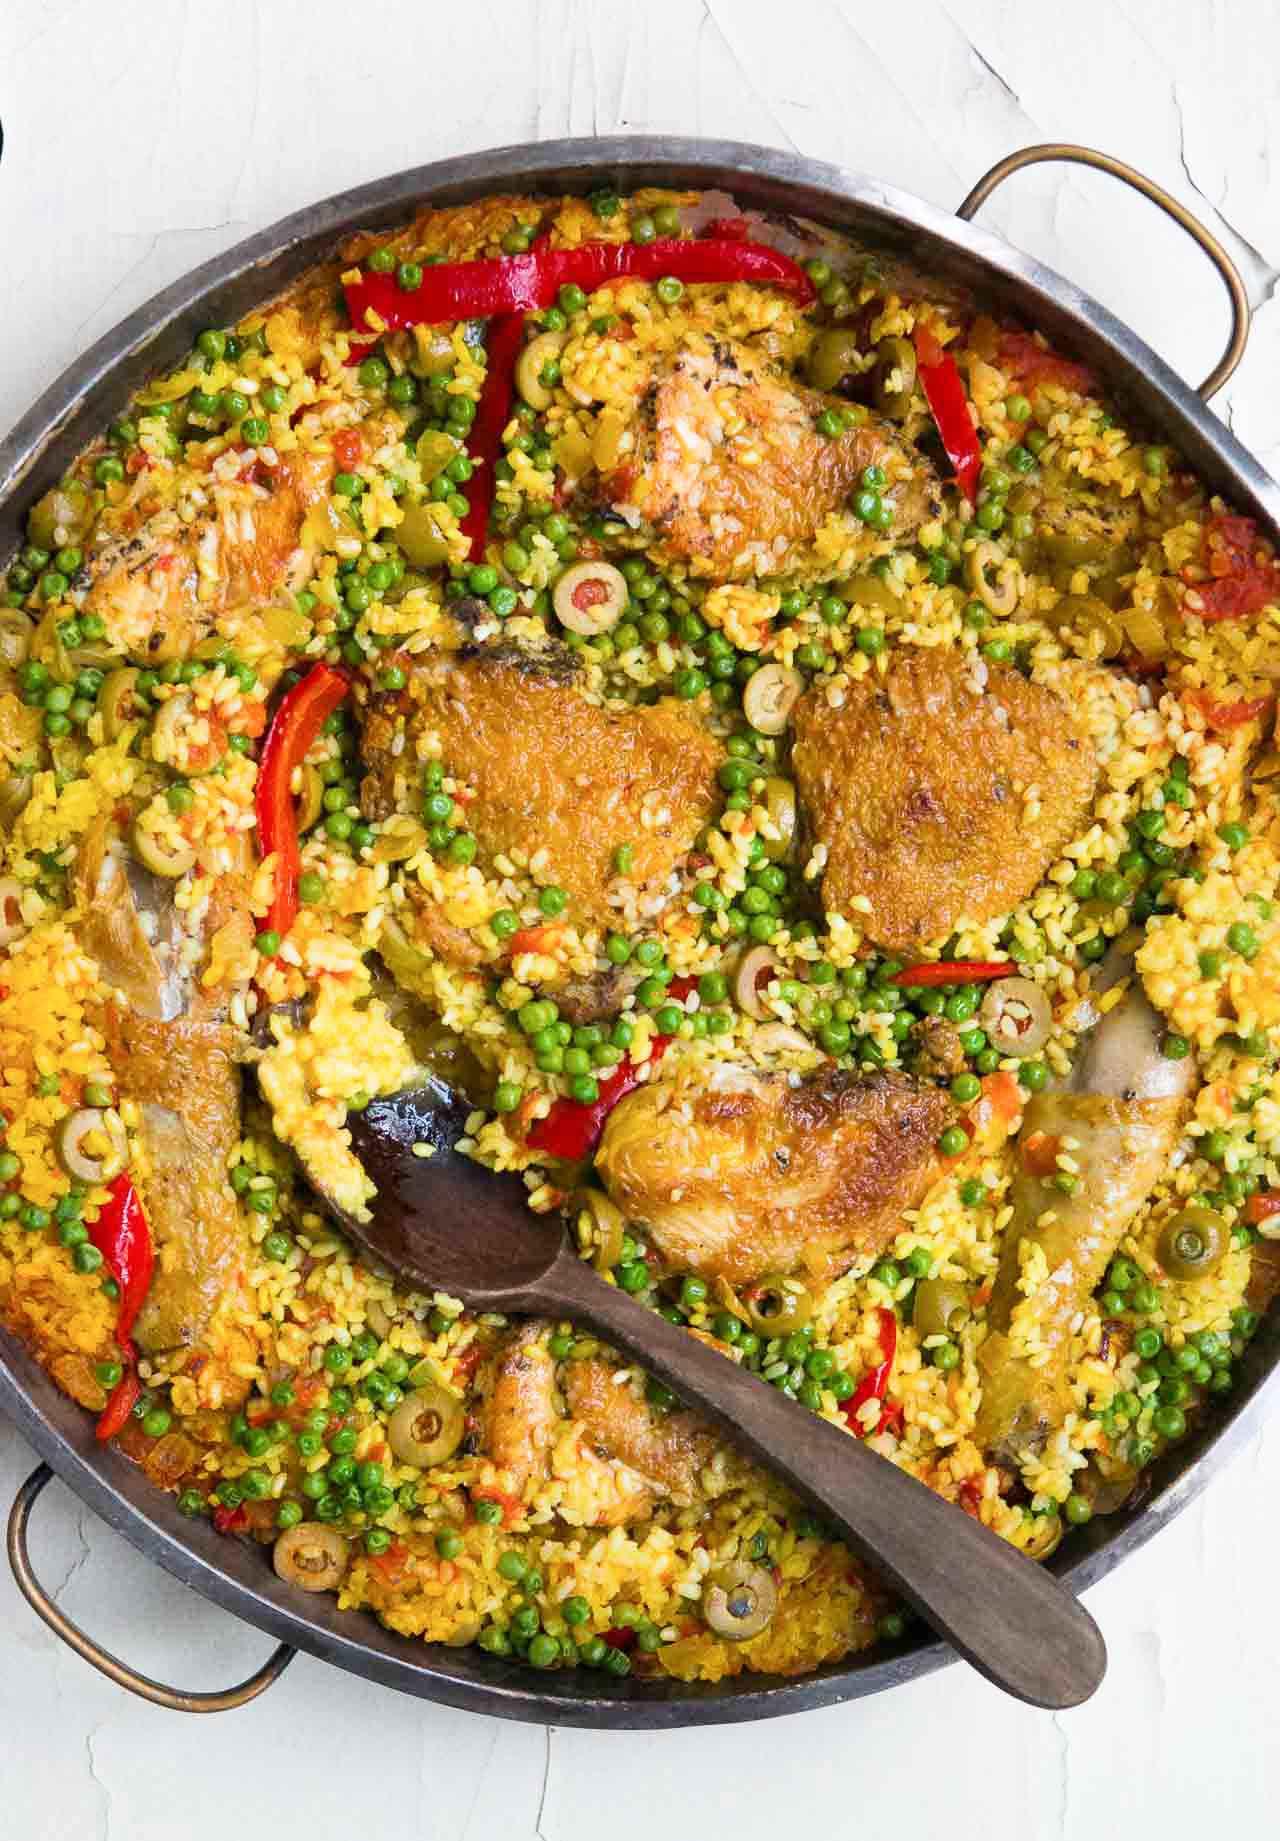 Arroz con pollo spanish chicken with rice david lebovitz ccuart Choice Image